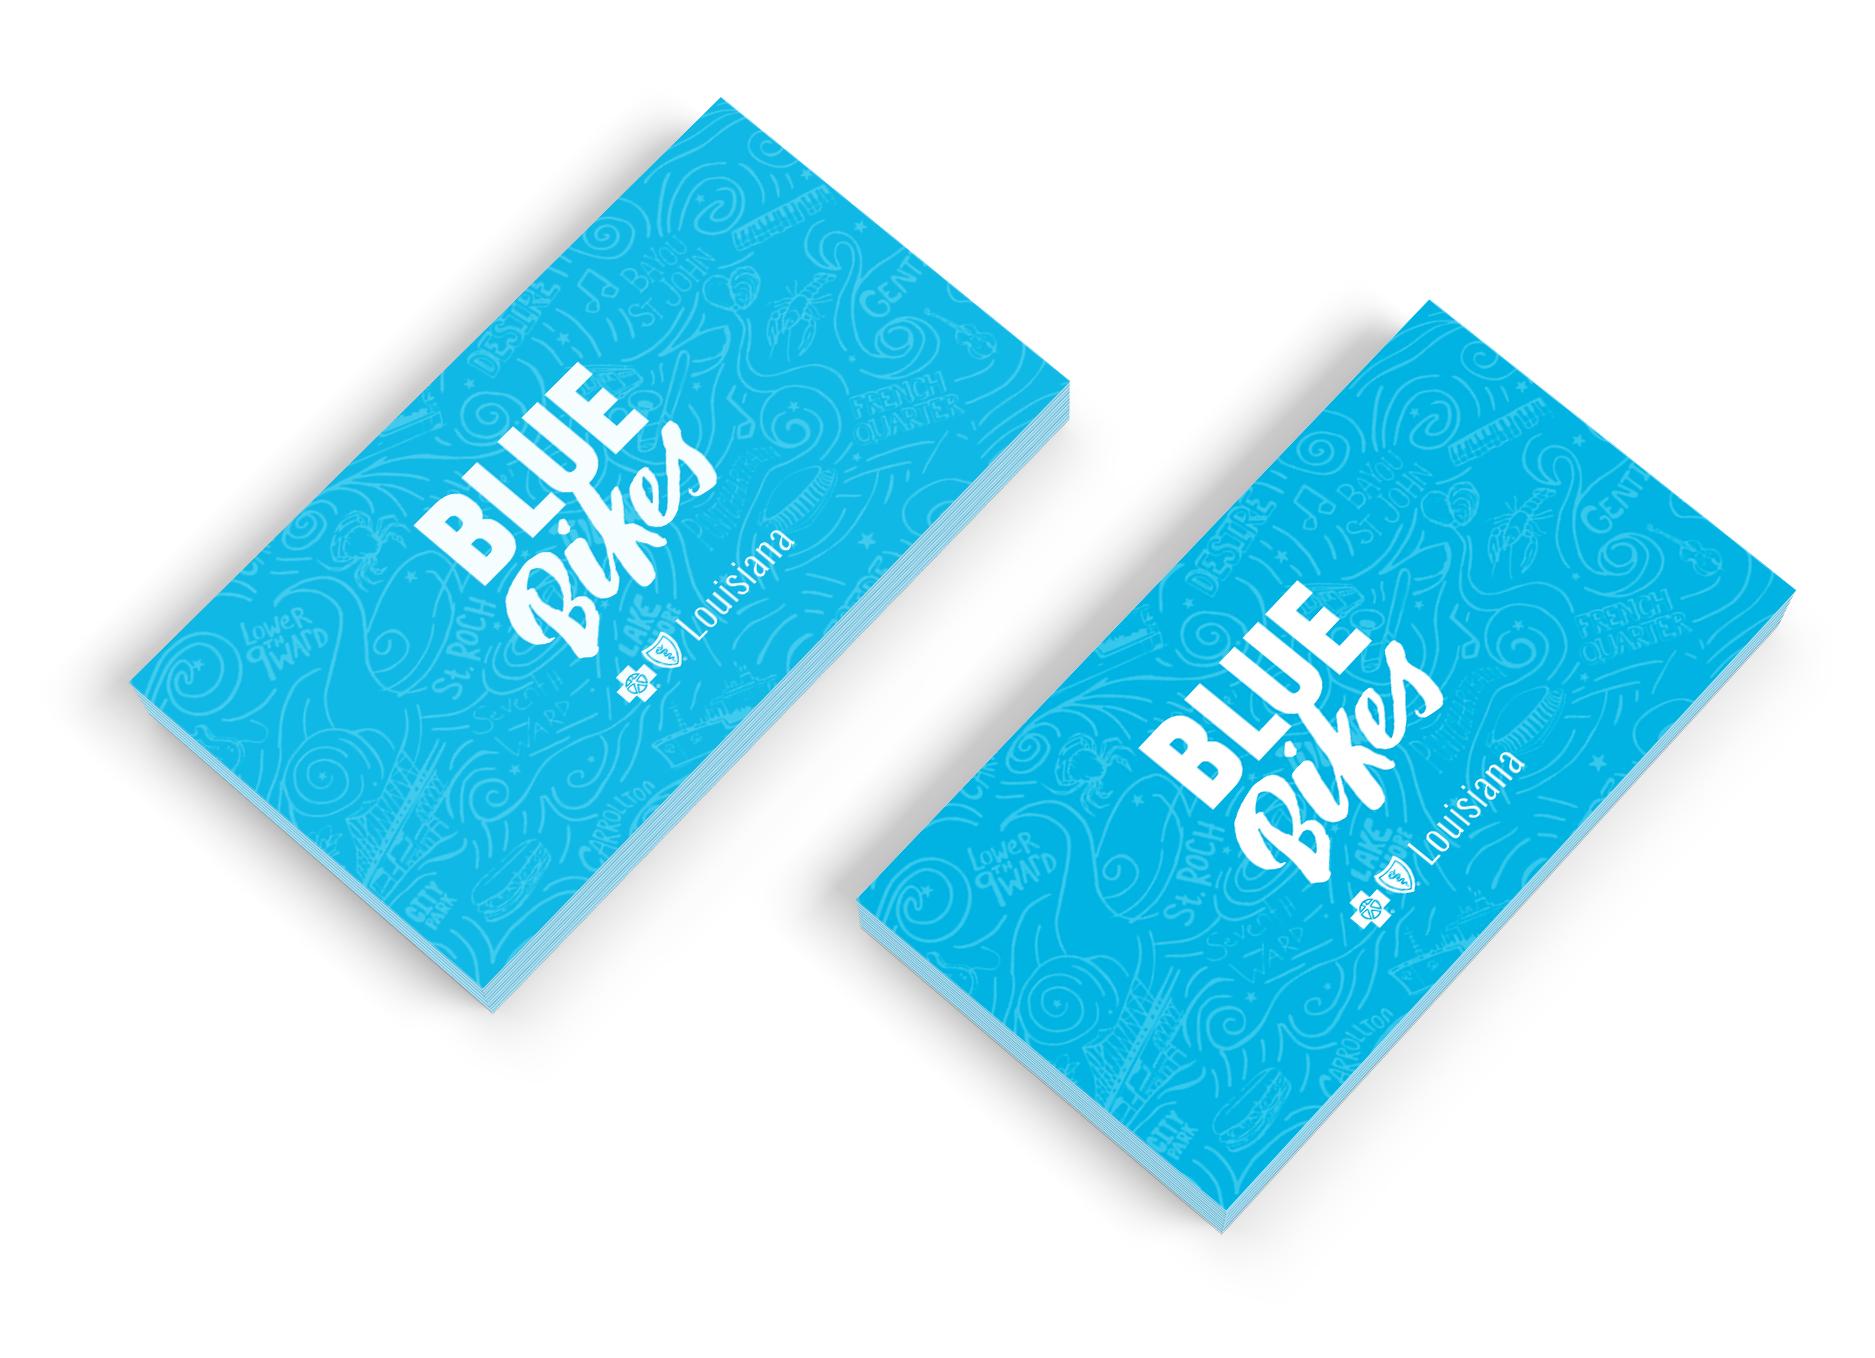 BBNOLA_cards